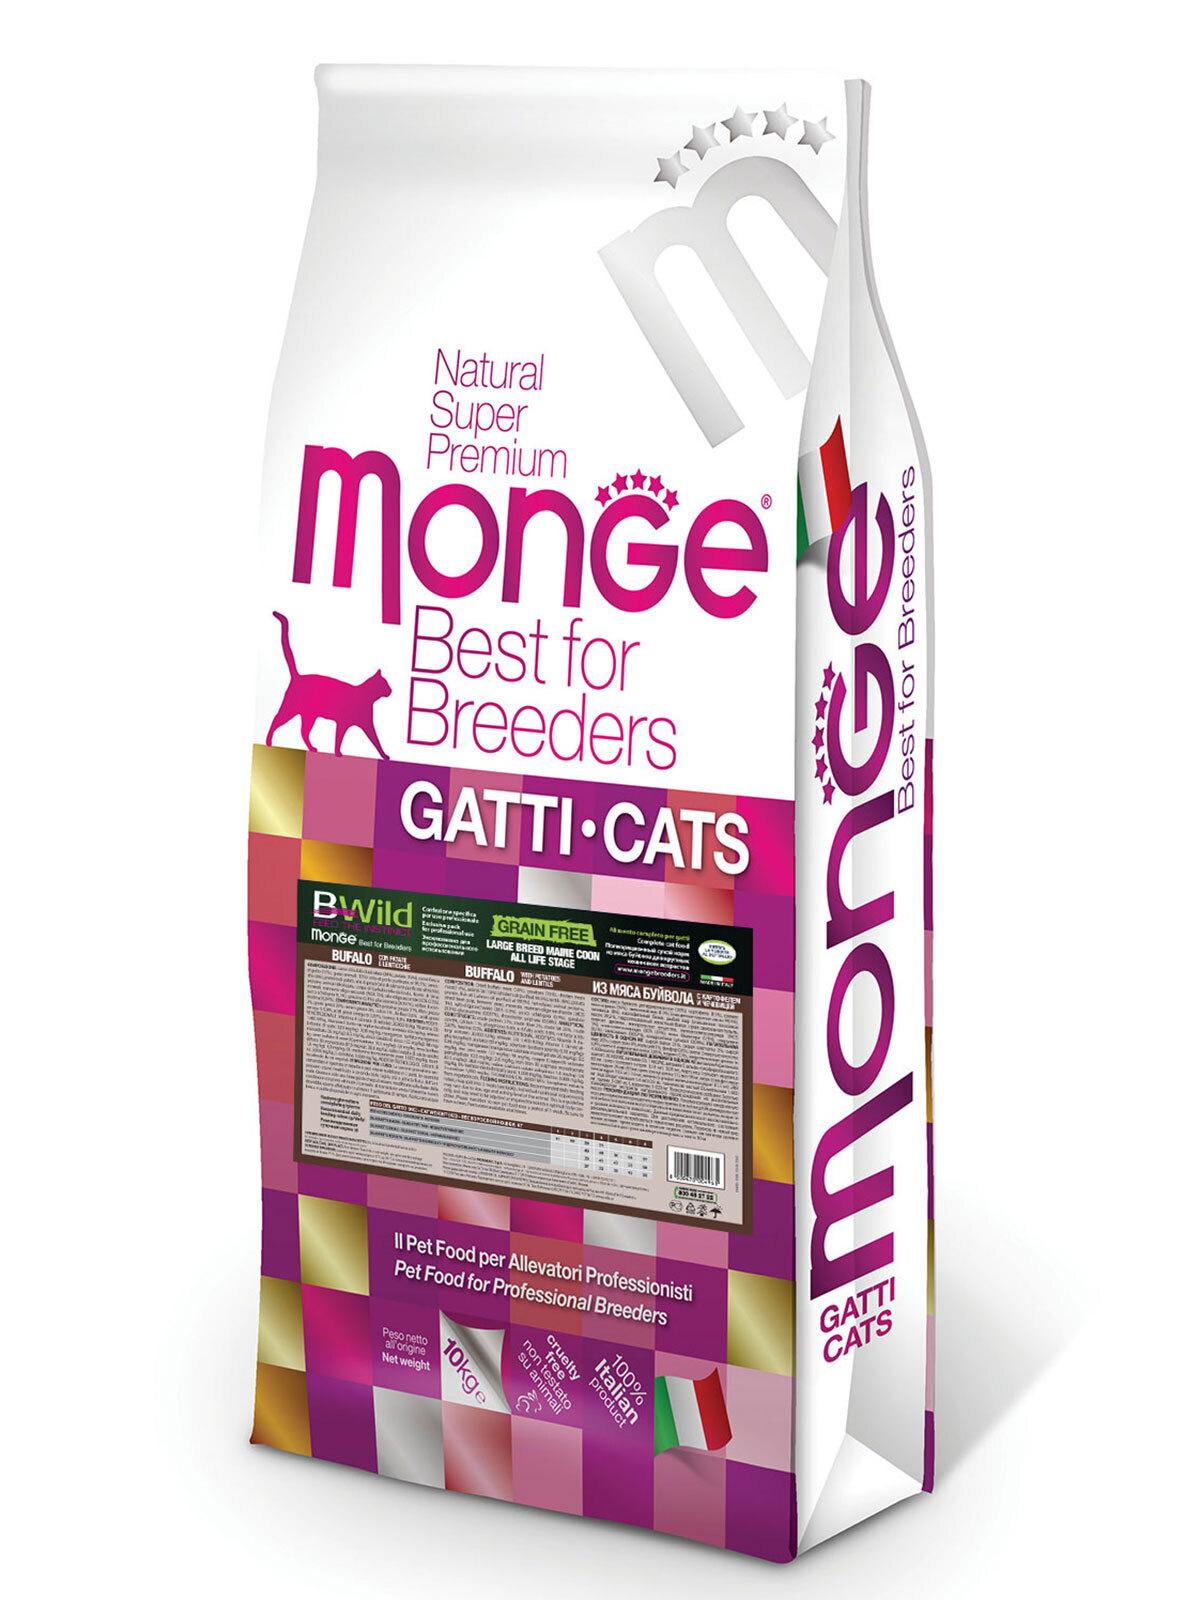 Monge Cat BWild Grain Free корм для взрослых кошек крупных пород, беззерновой, мясо буйвола 10 кг